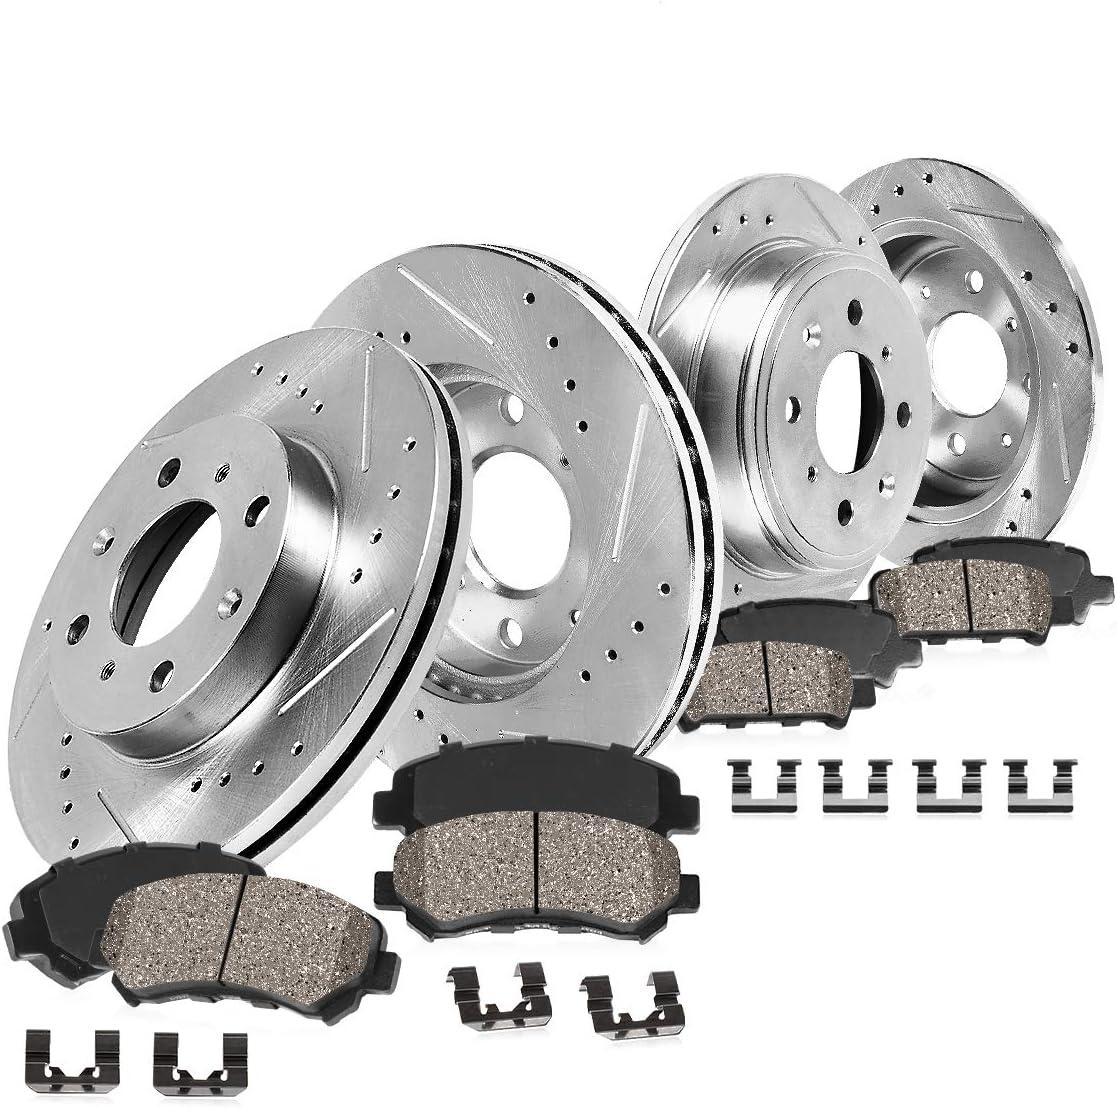 Callahan CDS03695 FRONT 262mm + 新作通販 REAR 239mm S Lug Rotors SALE開催中 4 D